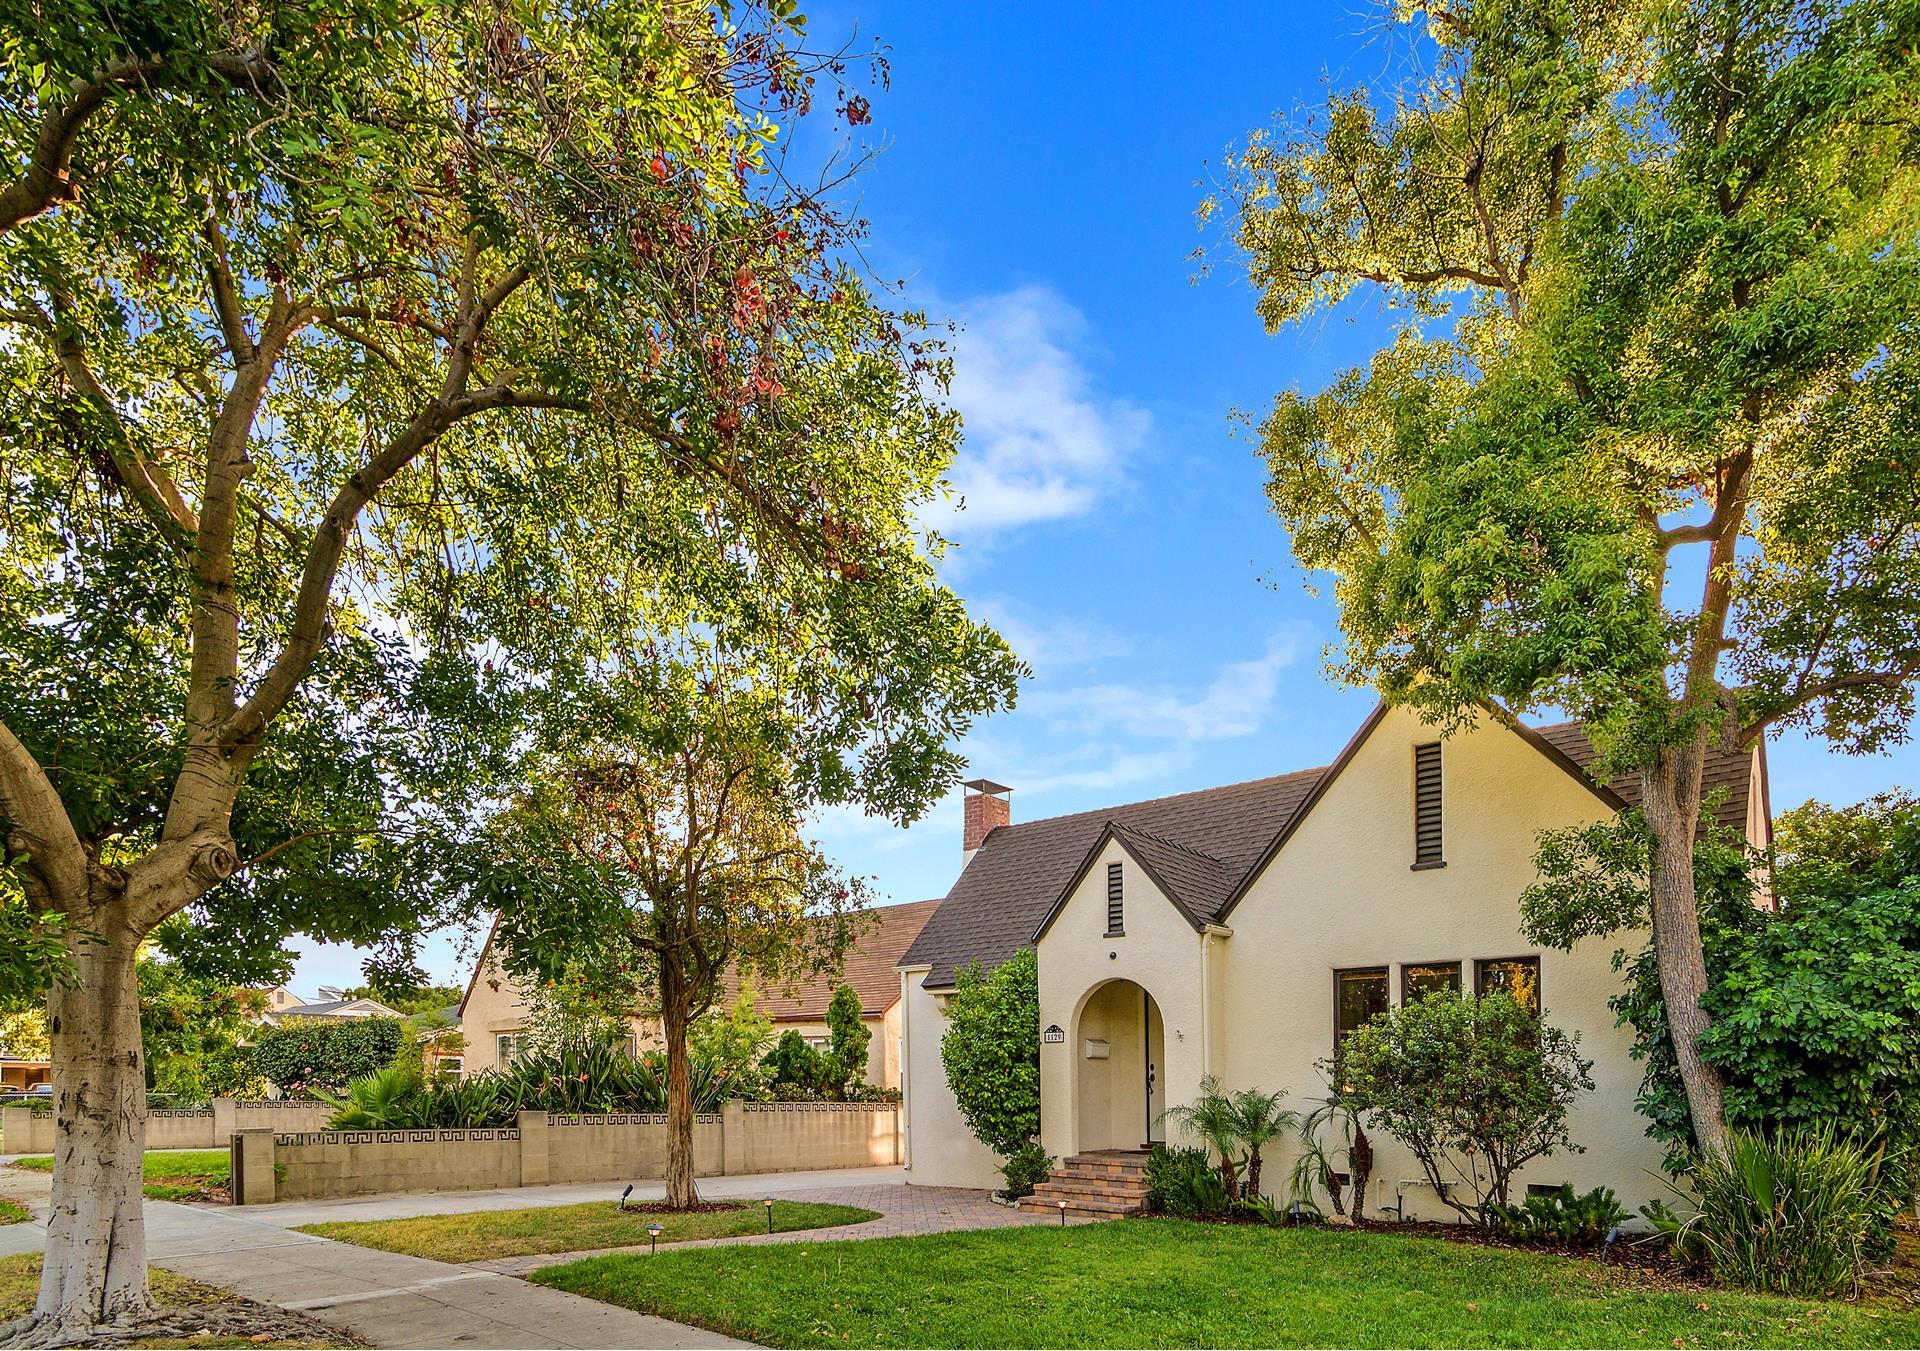 1129 N Myers Street - Burbank, California